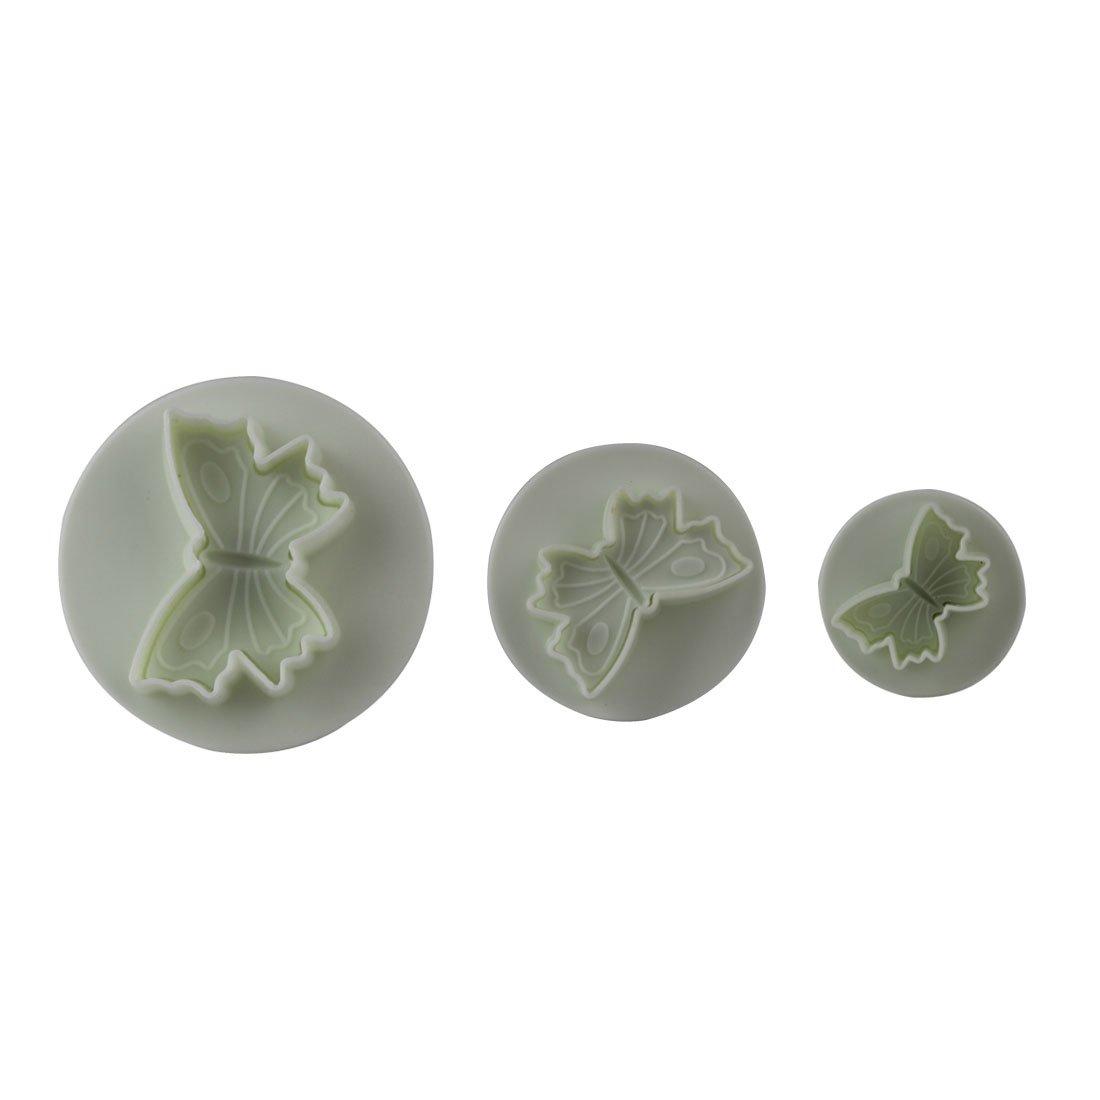 Luwu-Store 3Pcs/Set Butterfly Plunger Cutter Mold Decorating Diy Tool Christmas Kitchen Mini Fondant Molds Decorating